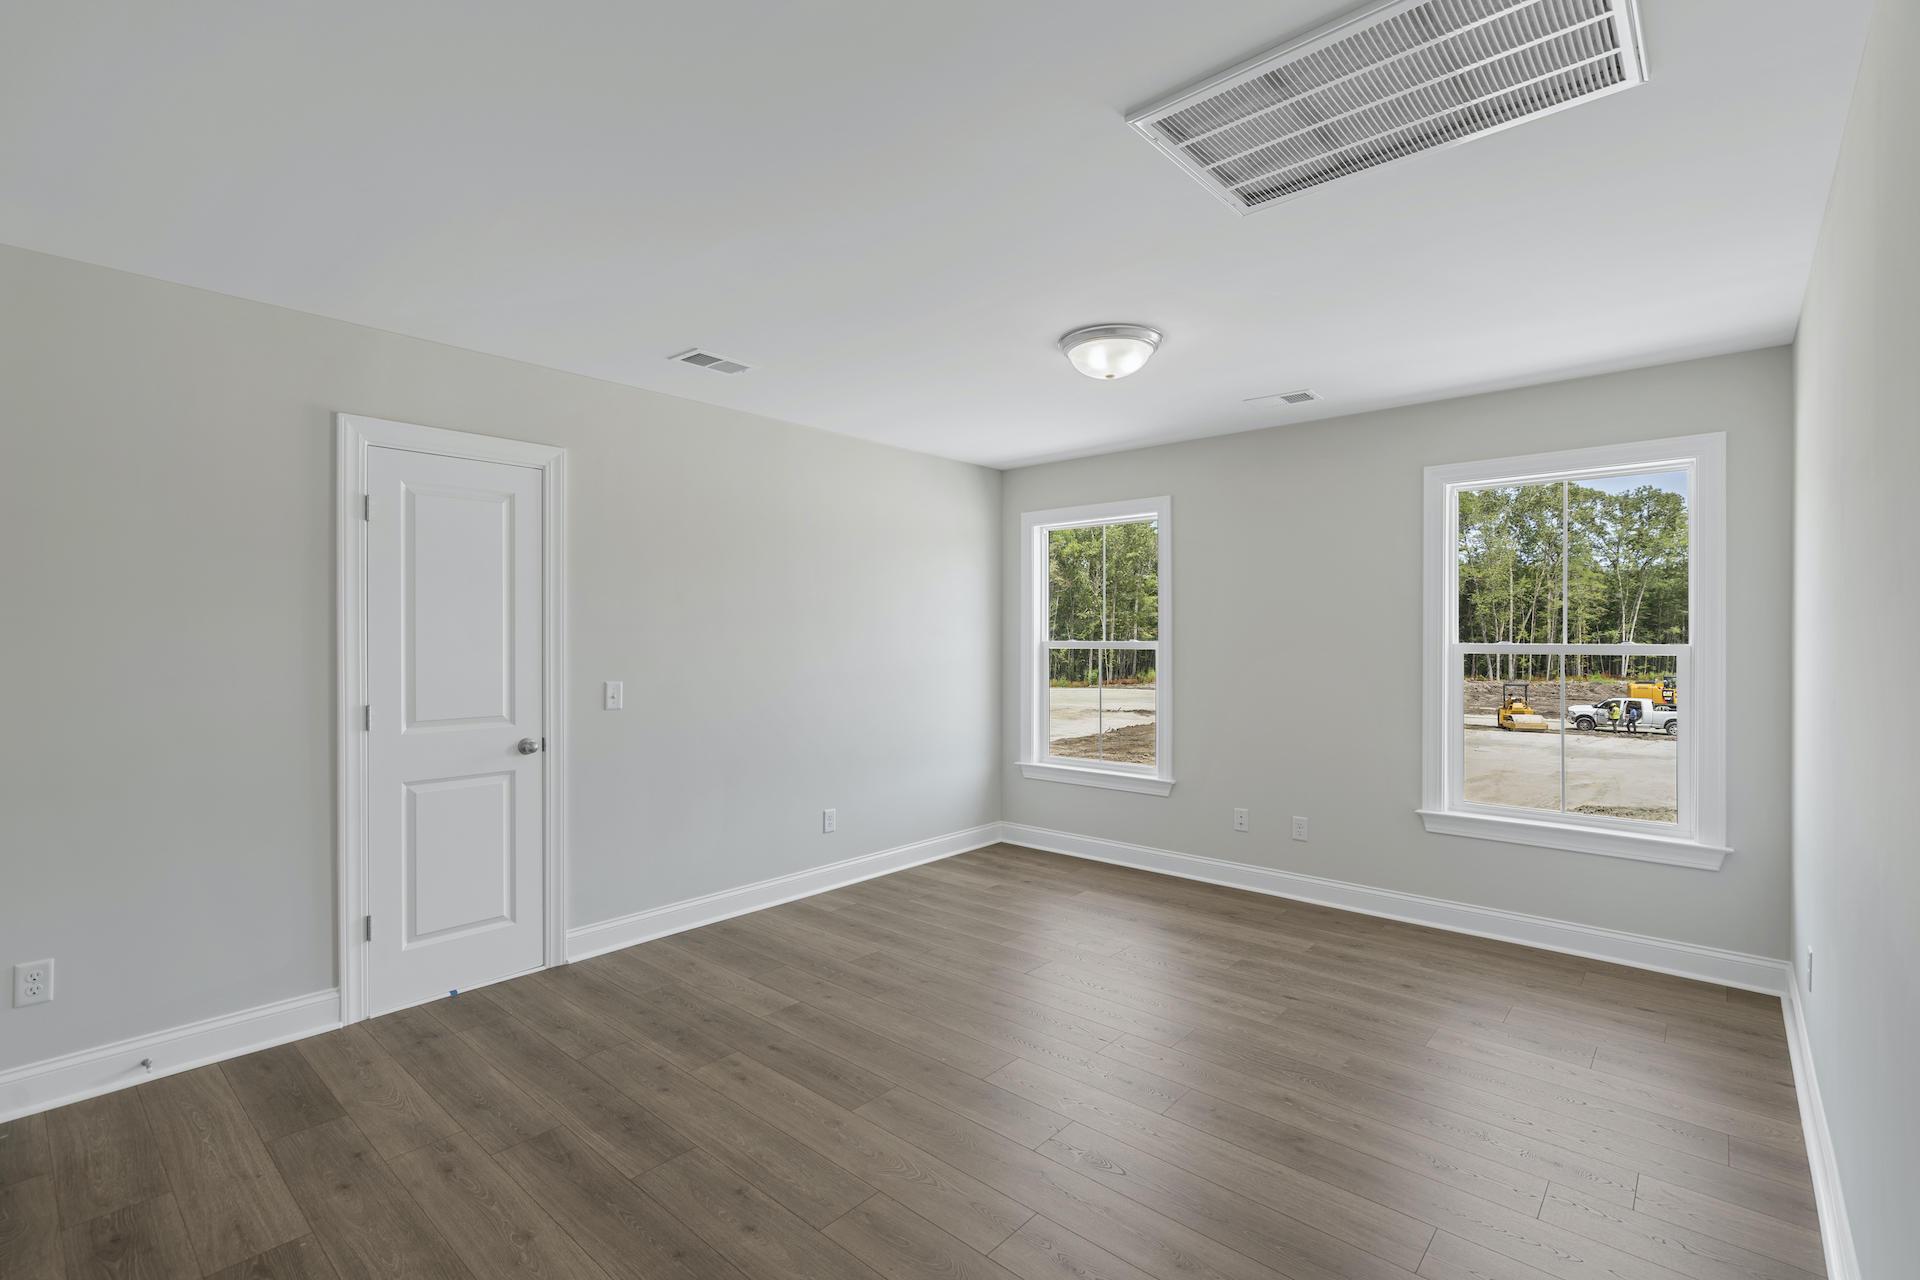 Drayton Oaks Homes For Sale - 105 Plowden Mill, Summerville, SC - 10